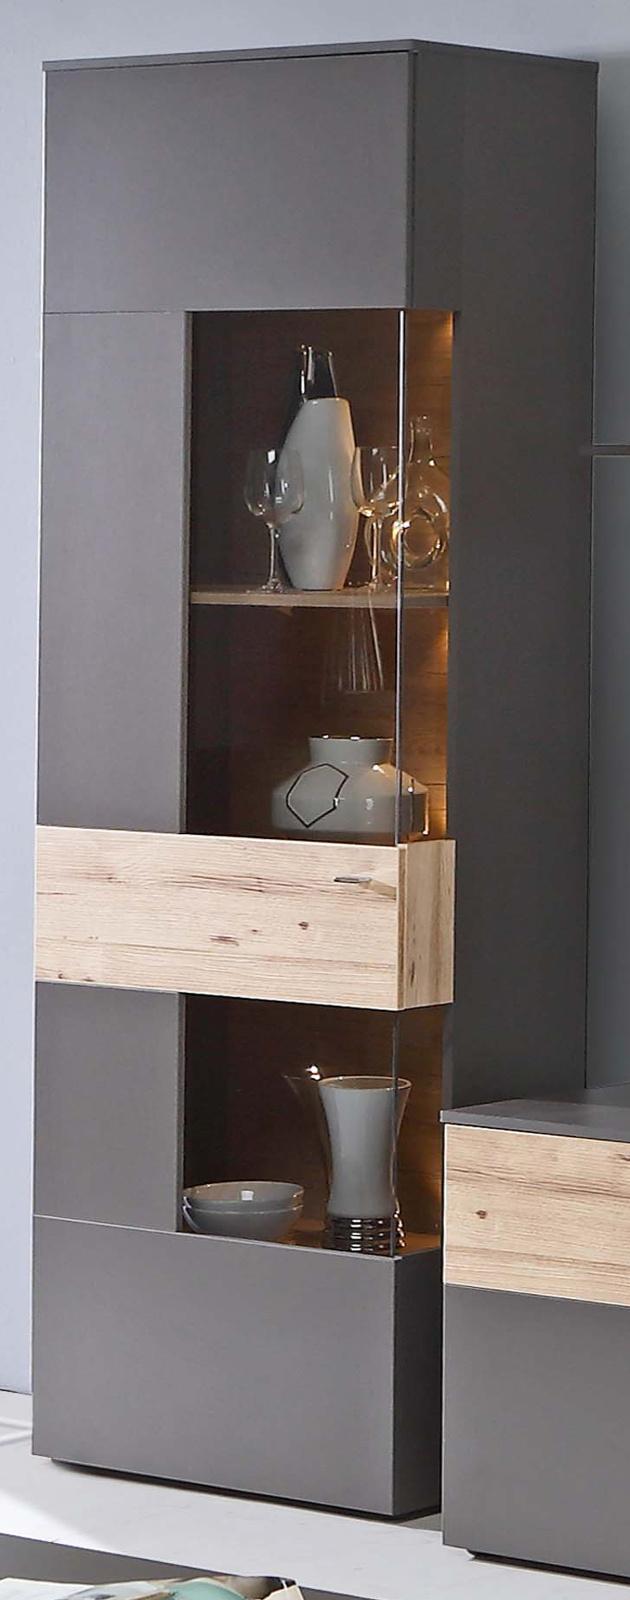 doppelbett komfortbett in 3 verschiedenen farben. Black Bedroom Furniture Sets. Home Design Ideas